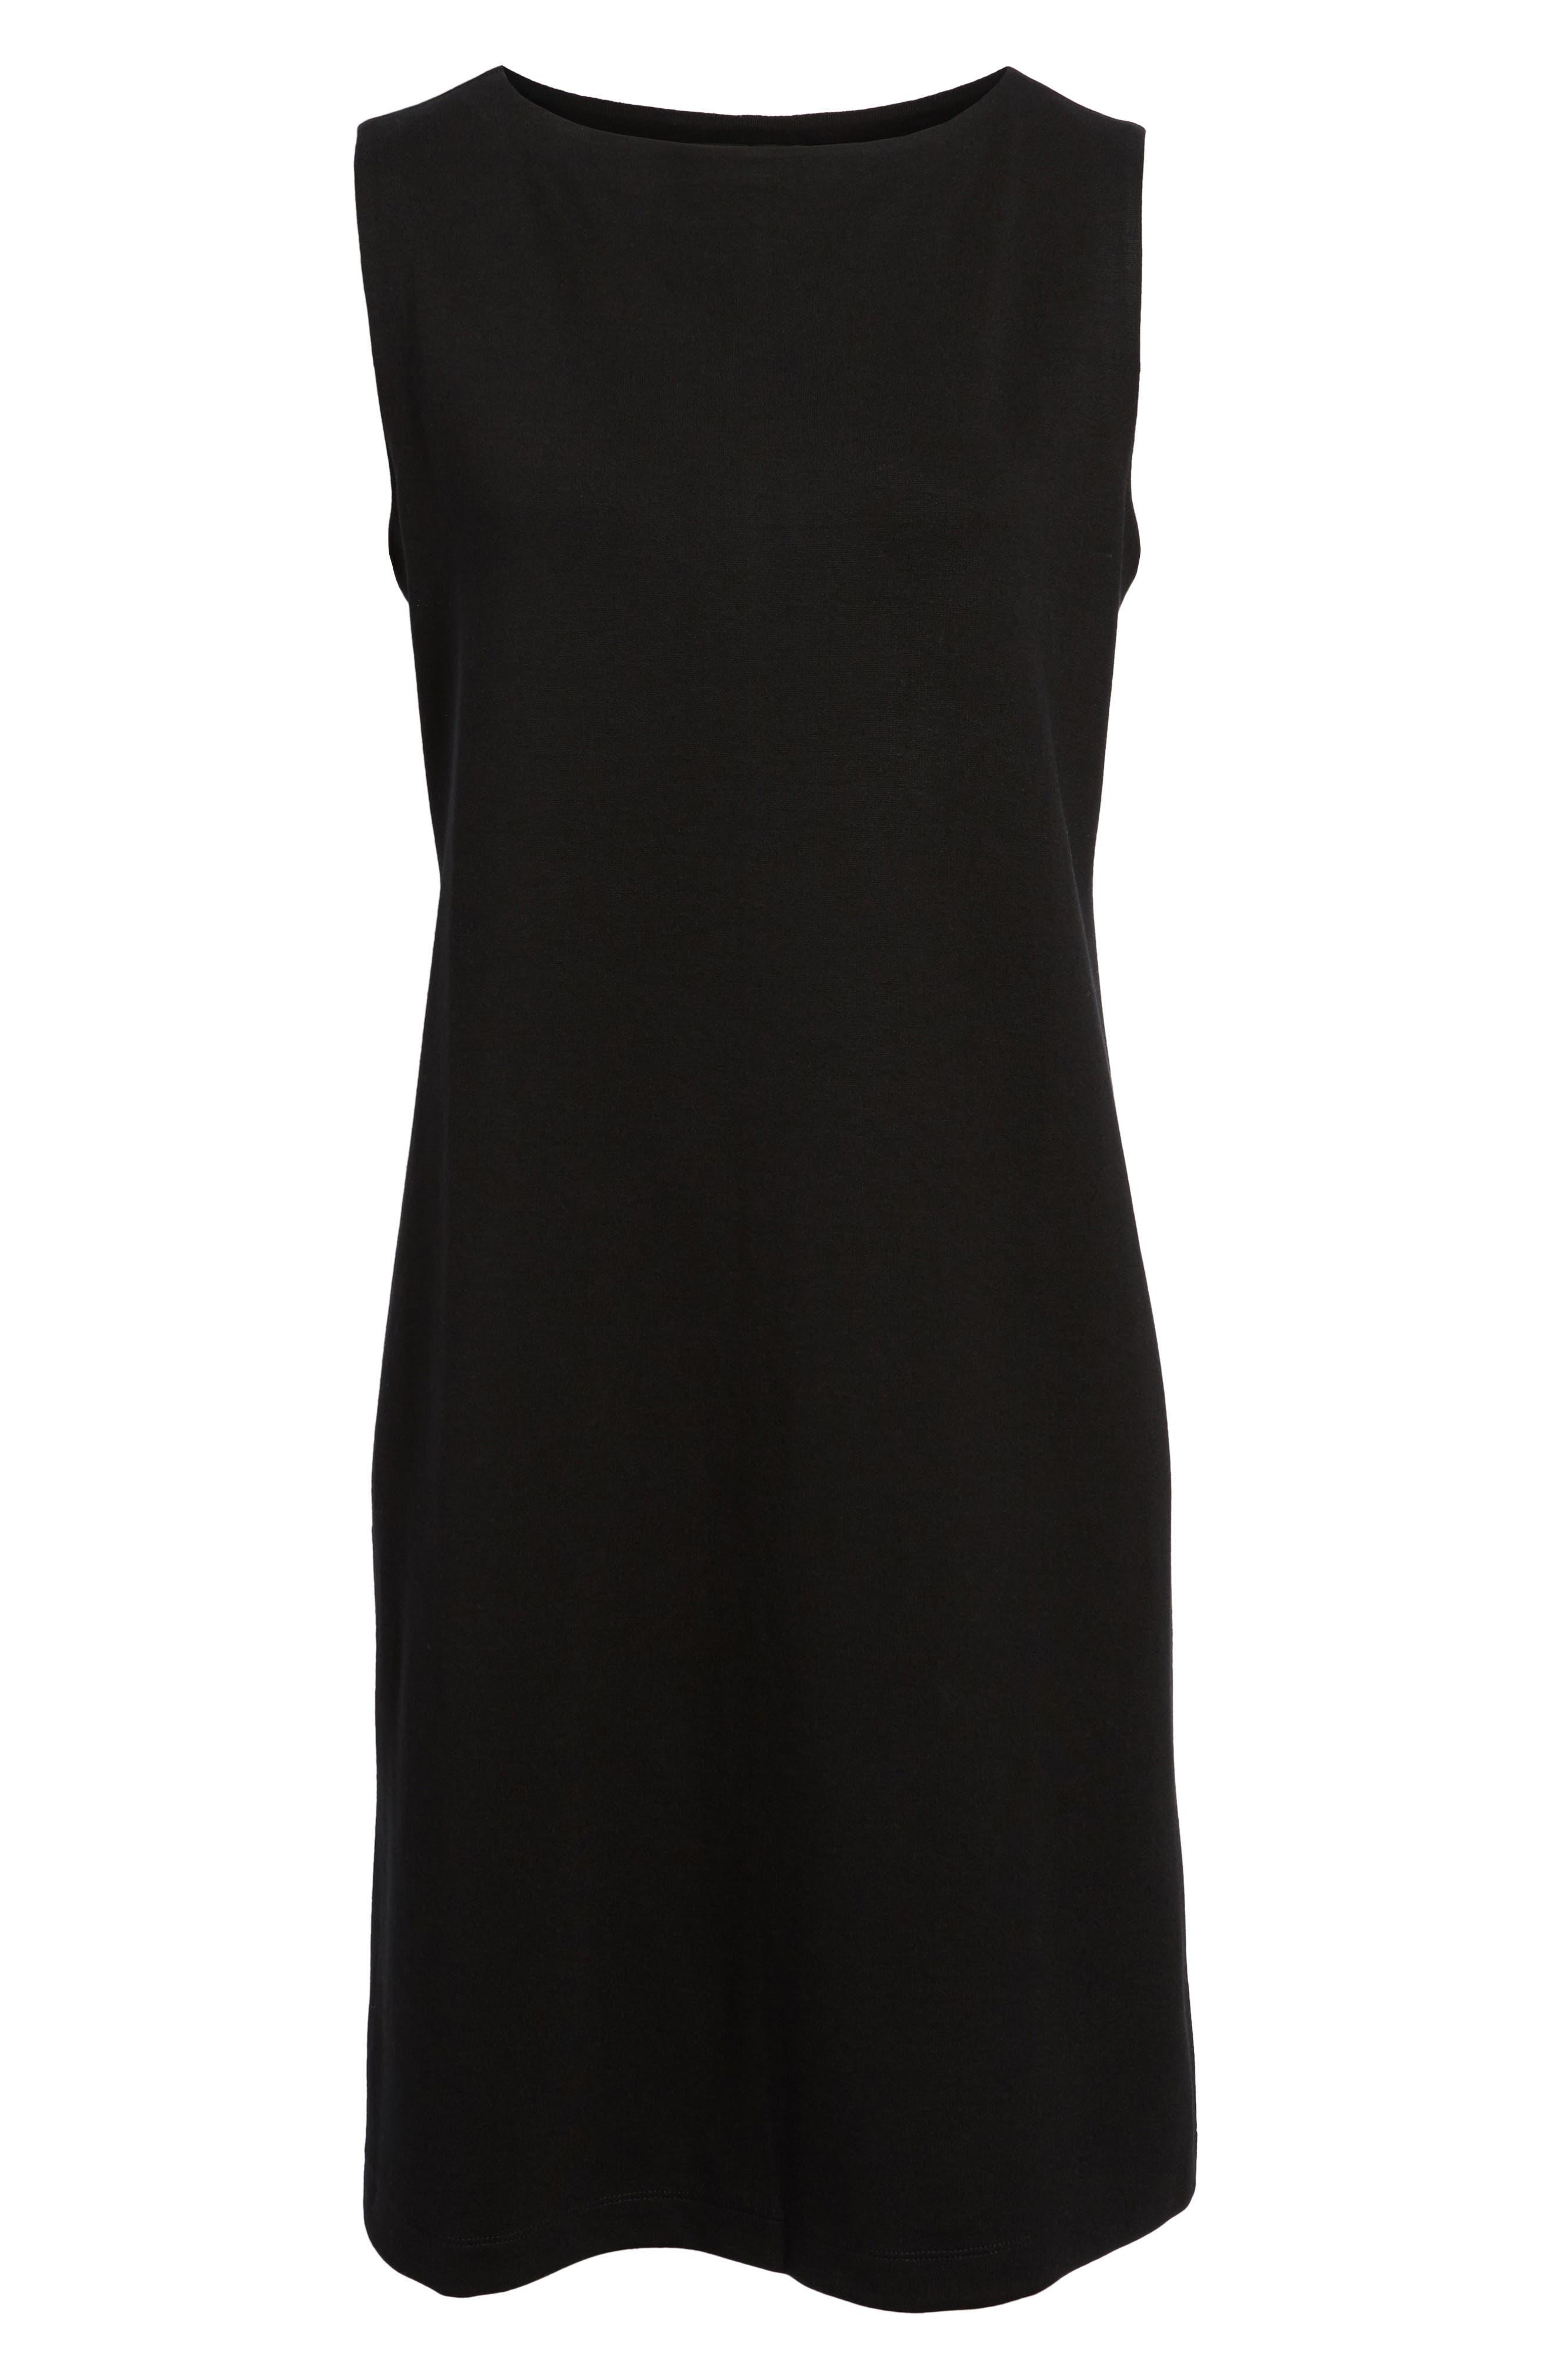 Tencel<sup>®</sup> Lyocell Blend Shift Dress,                             Alternate thumbnail 6, color,                             001